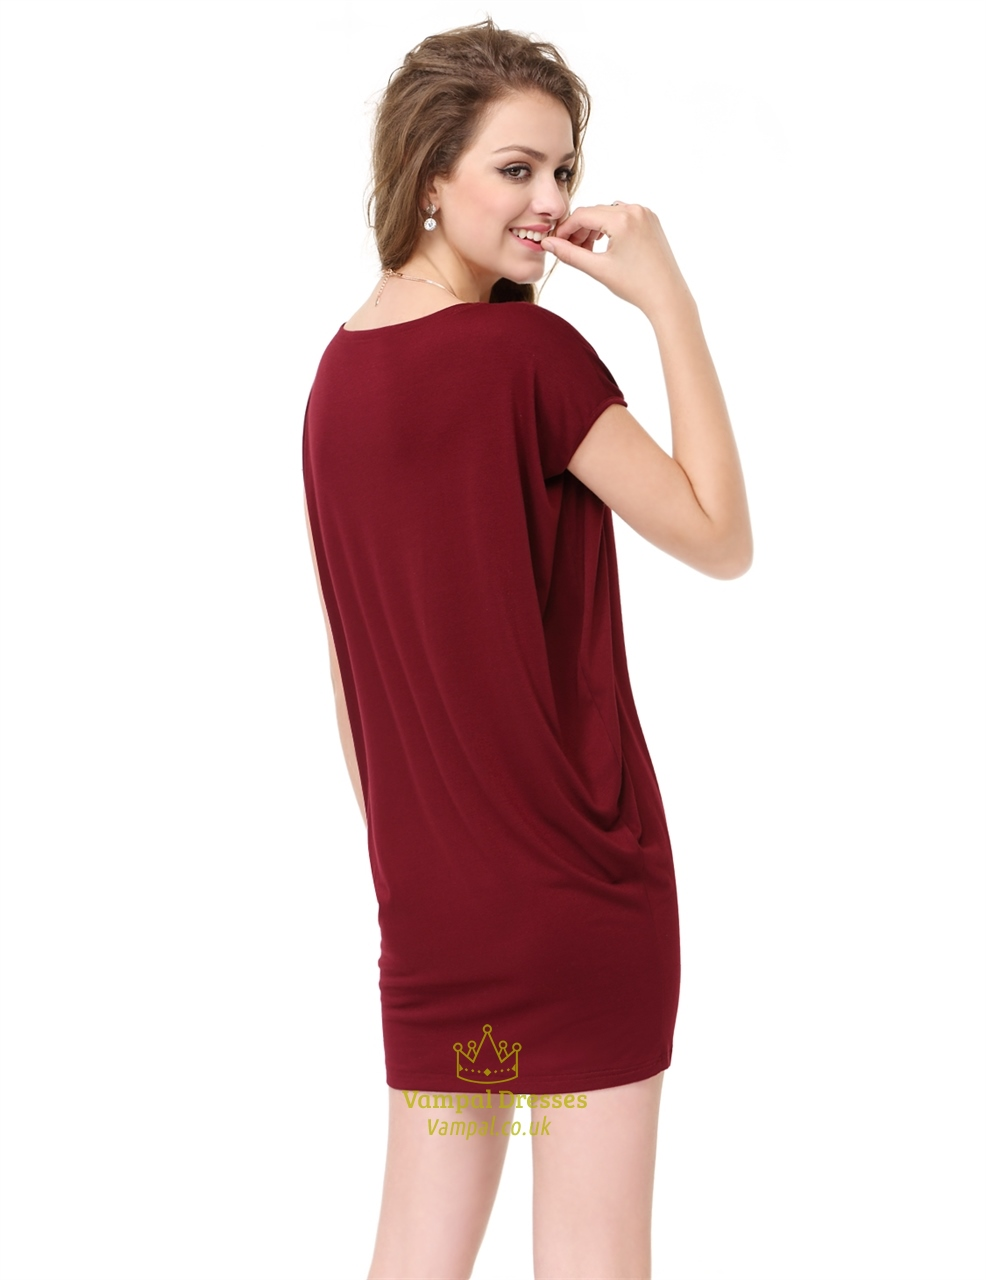 Perfect White Turtleneck Long Sleeve Crop Top @ Cicihot Top Shirt Clothing Online Store Dress Shirt ...